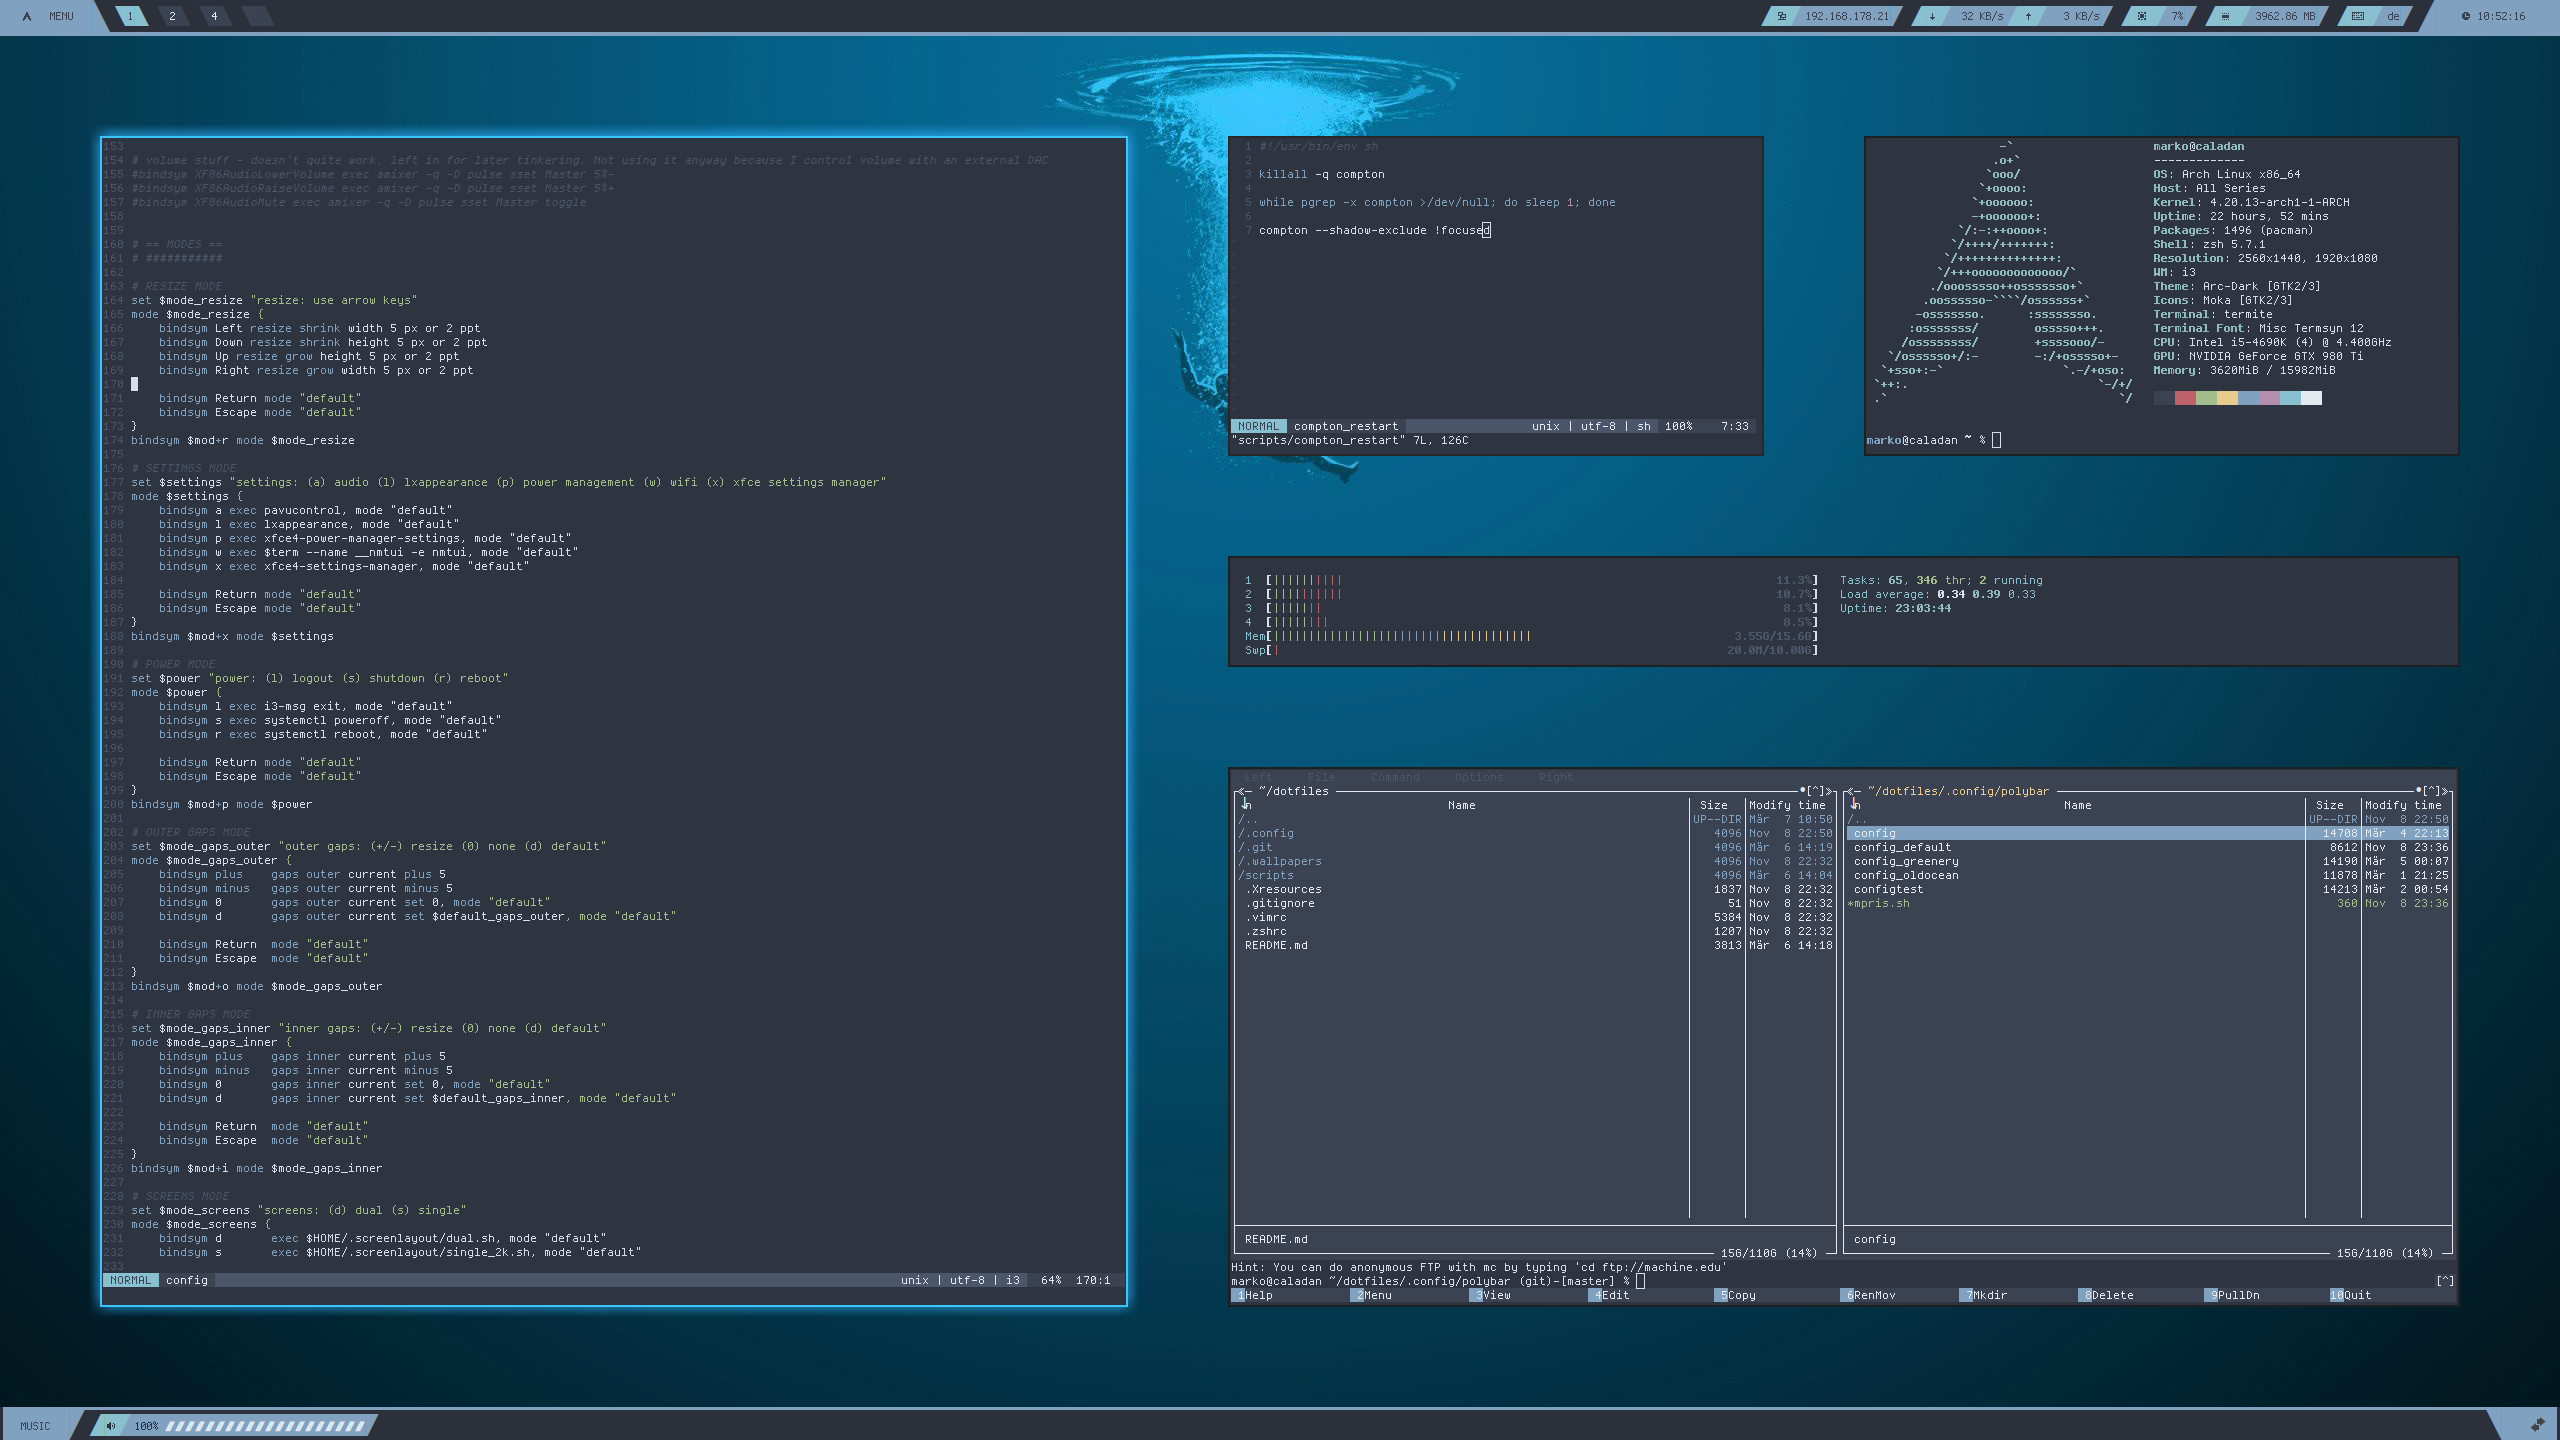 GitHub - suchtie/dotfiles: Desktop rice